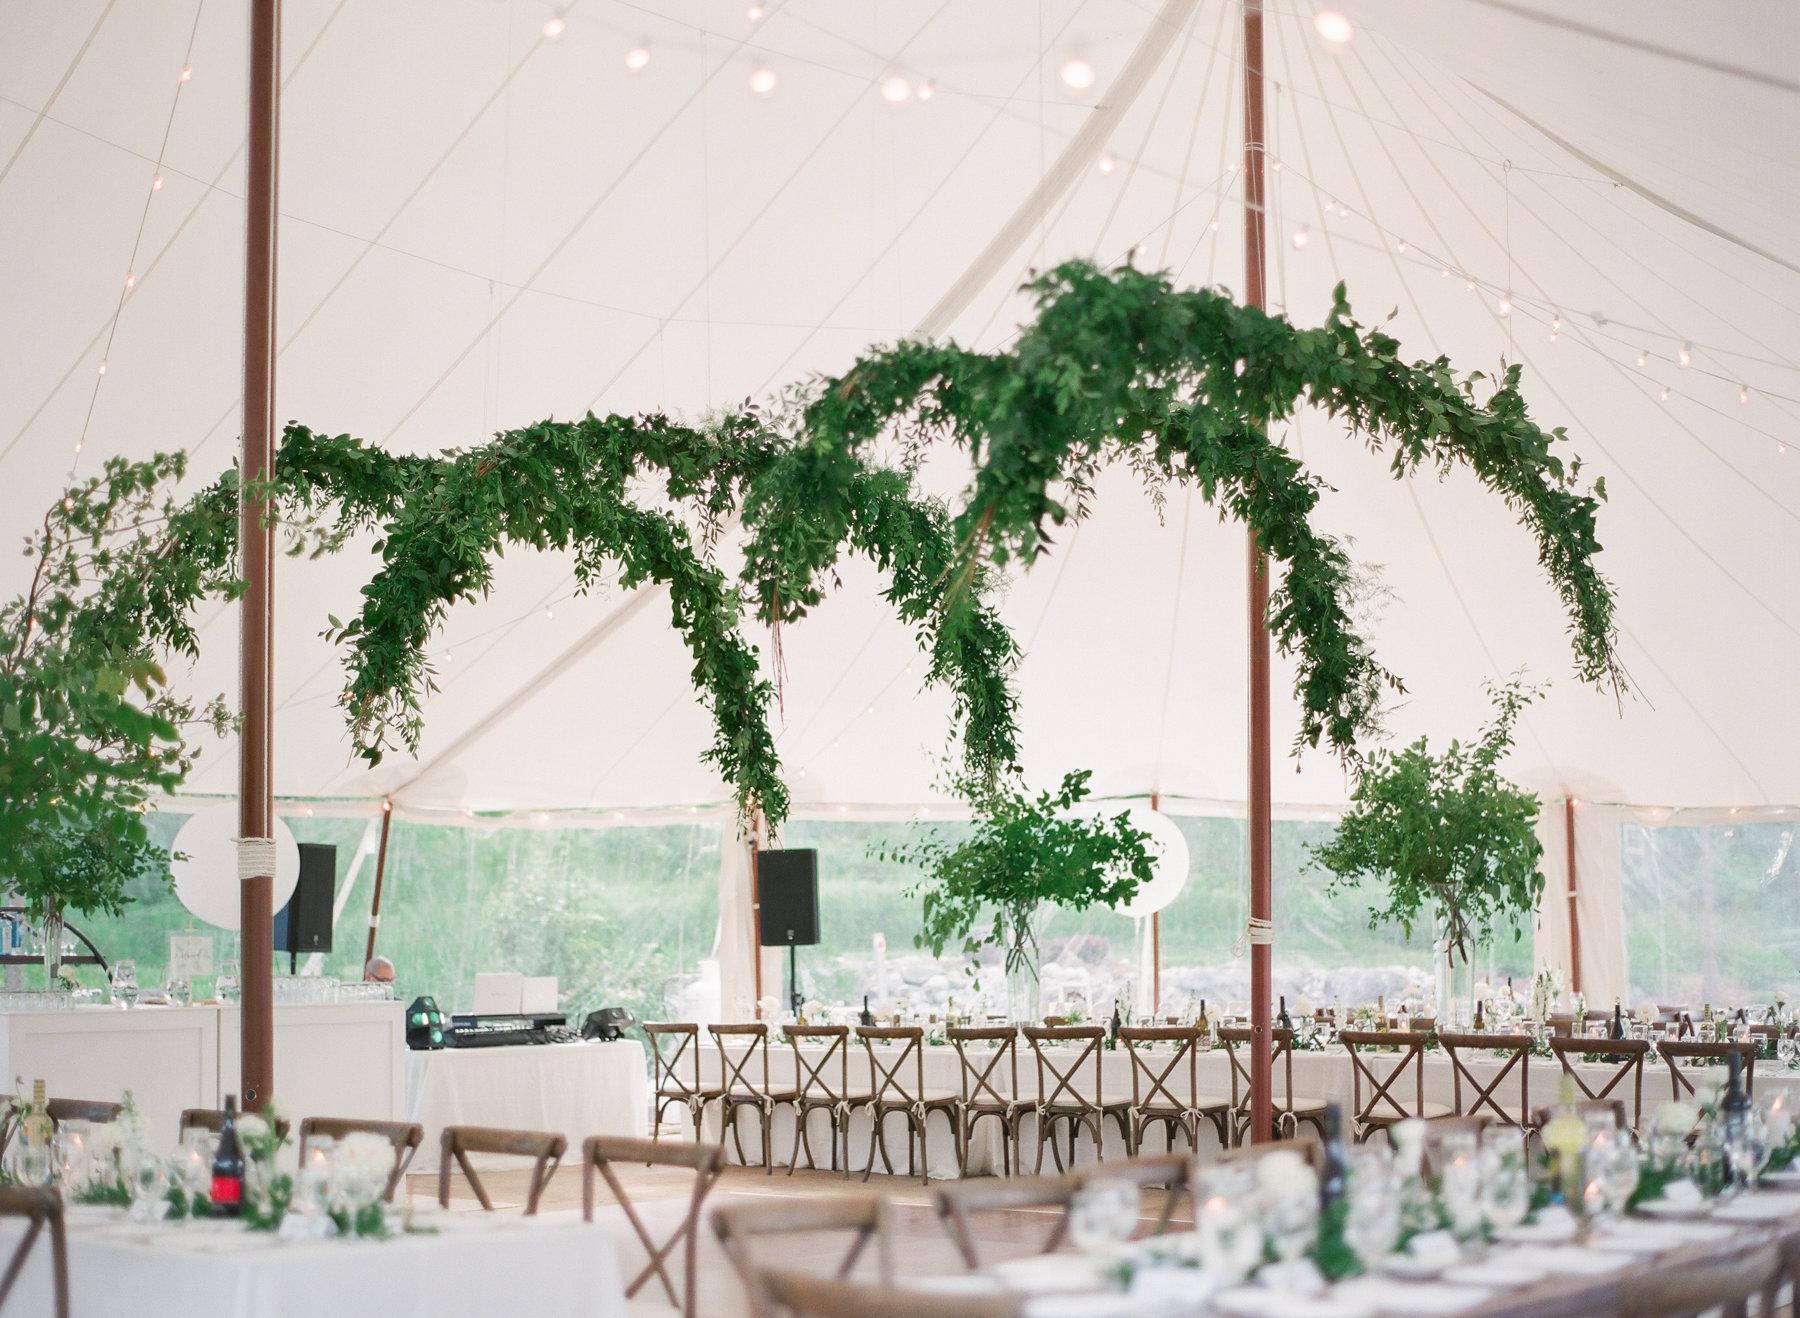 0797-maggiebrett-private-estate-wedding-000006530013.jpg